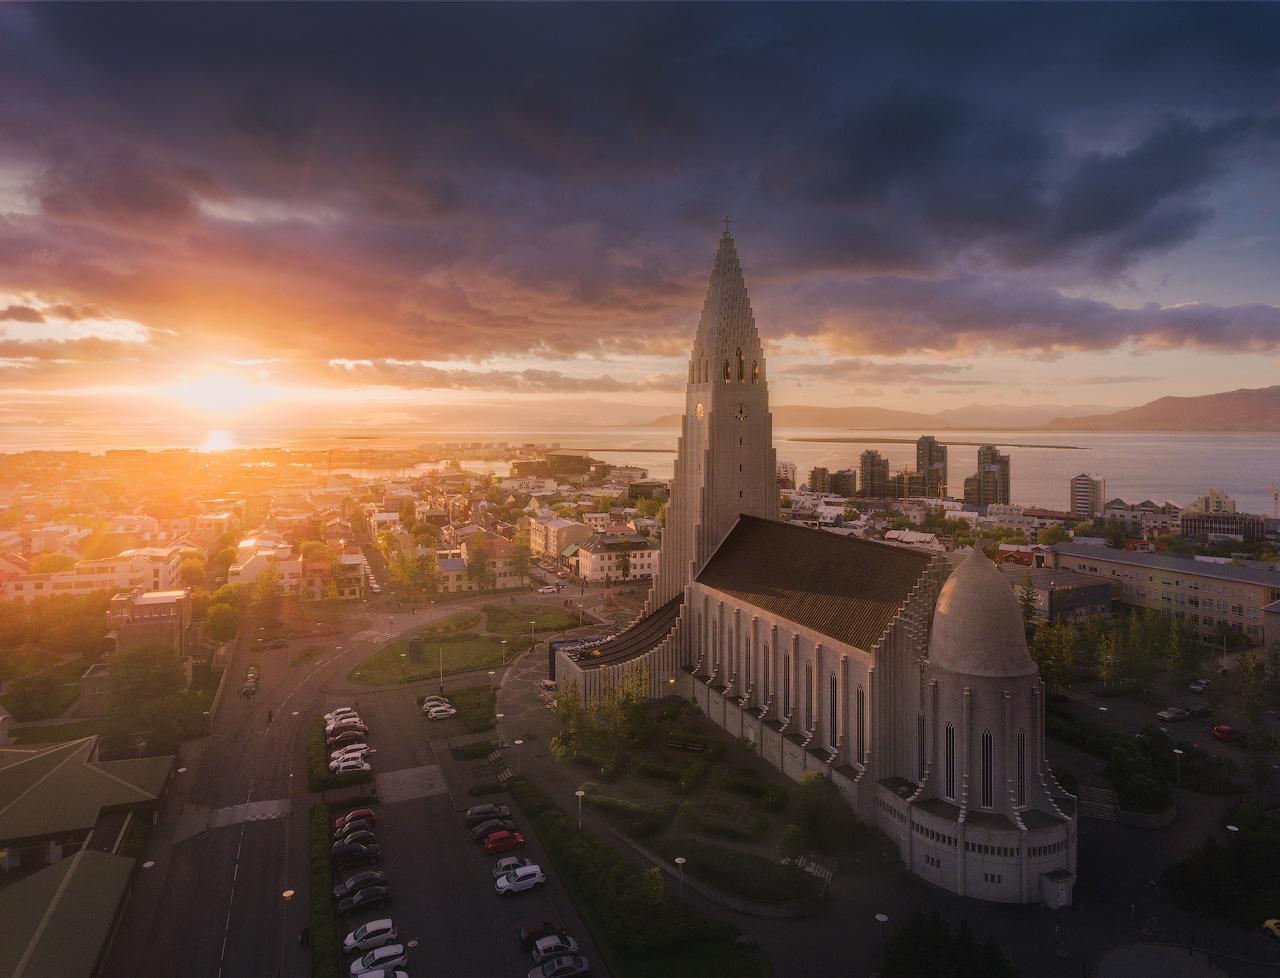 The iconic Hallgrímskirkja church in the city of Reykjavík bathed in the summer sun.